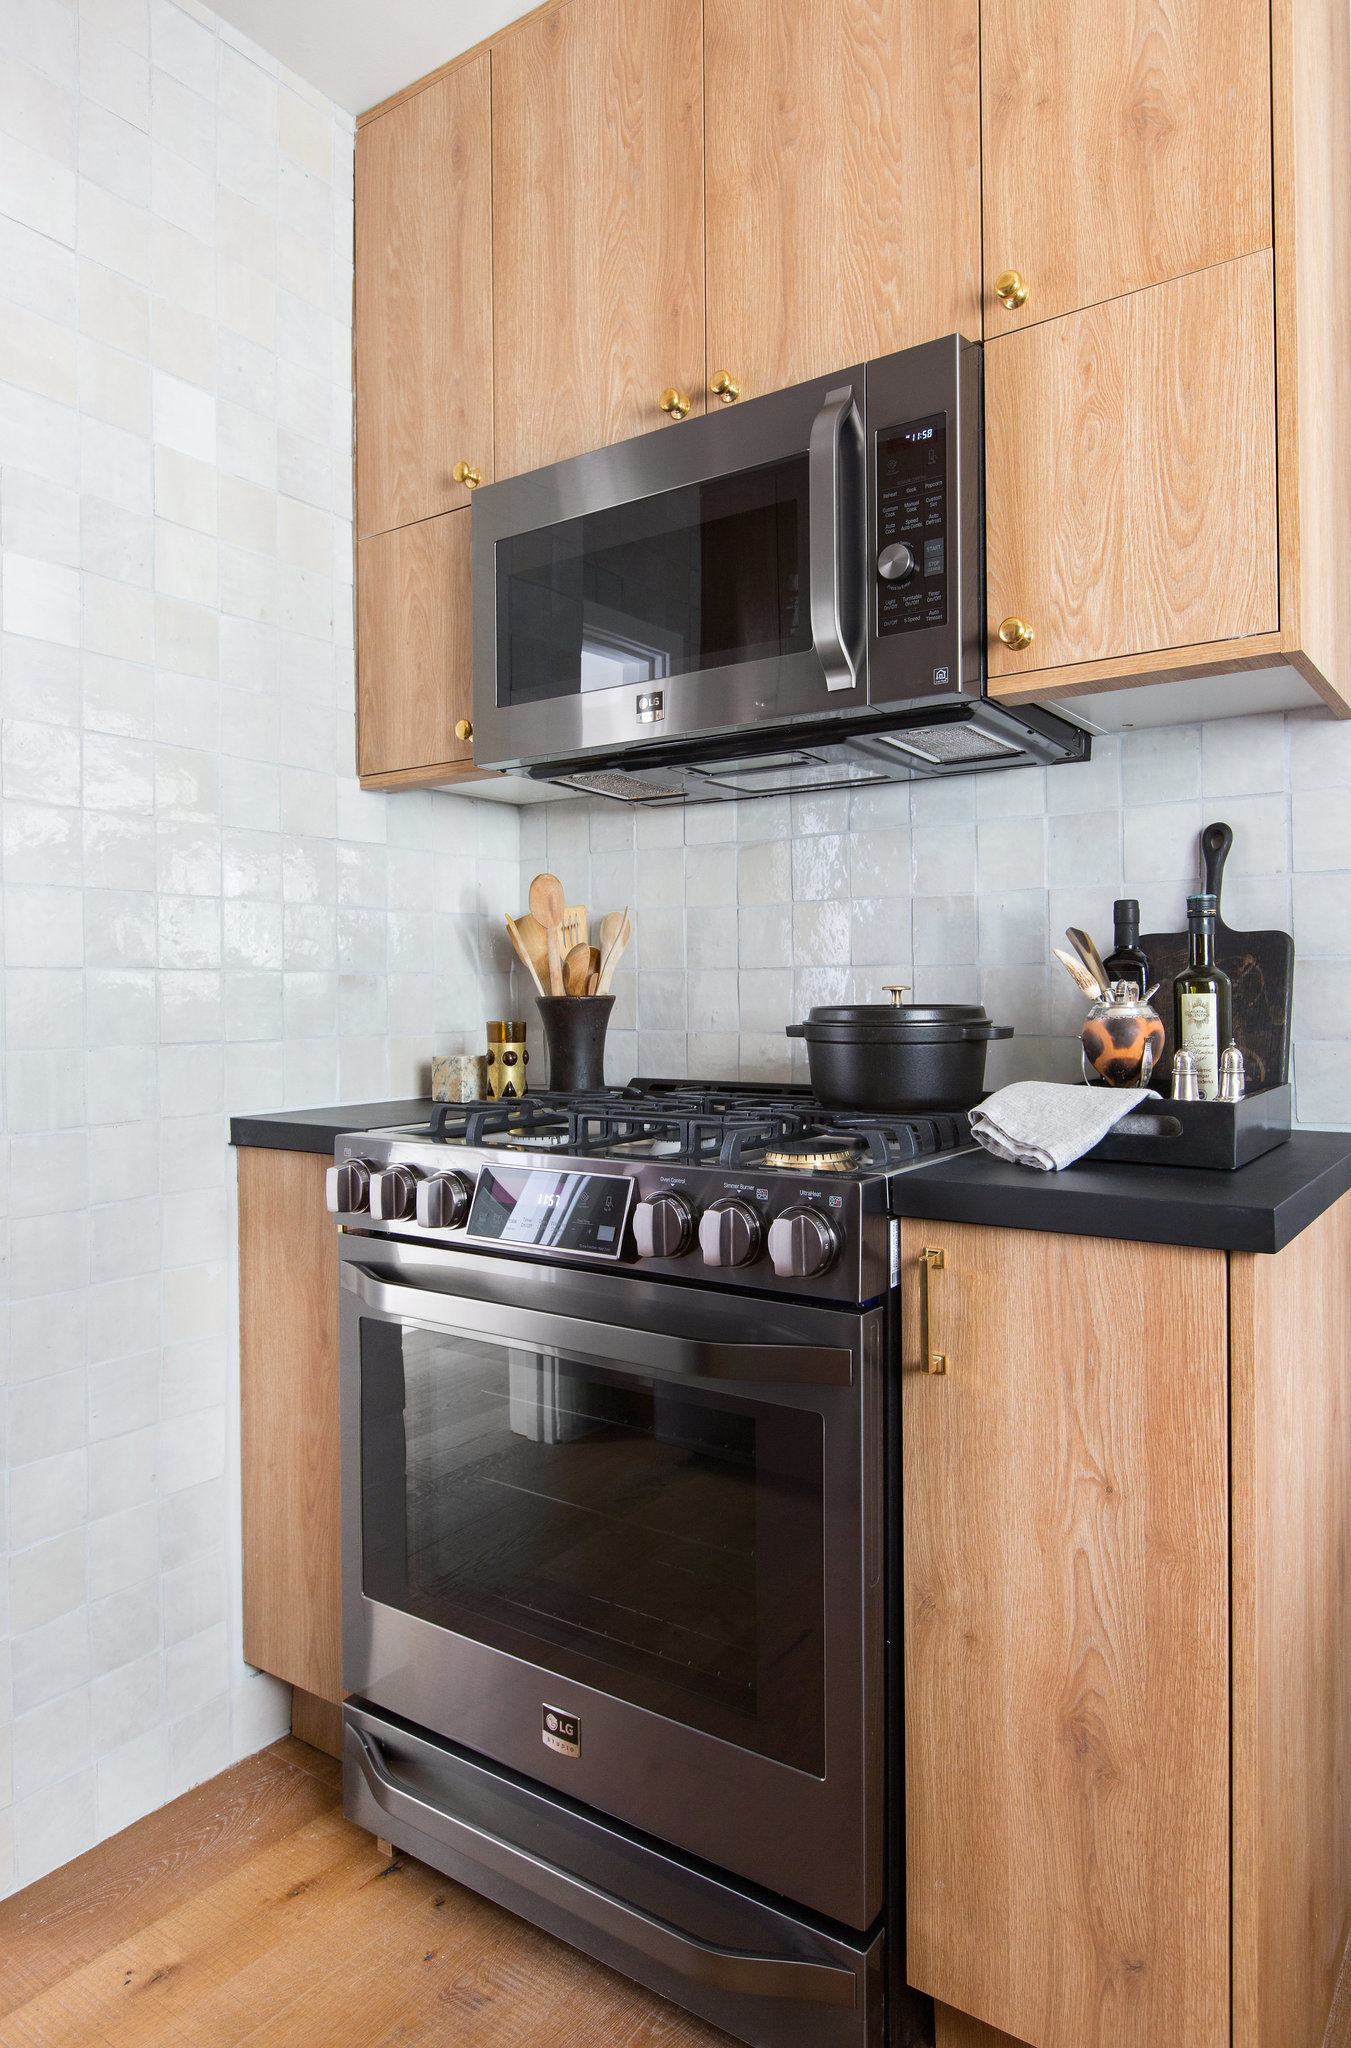 The Vintage and Stunning Kitchen at Nate Berku's Colonial House Stunning Kitchen The Vintage and Stunning Kitchen at Nate Berkus's Colonial House la 1519342591 pbuuqv52dm snap image